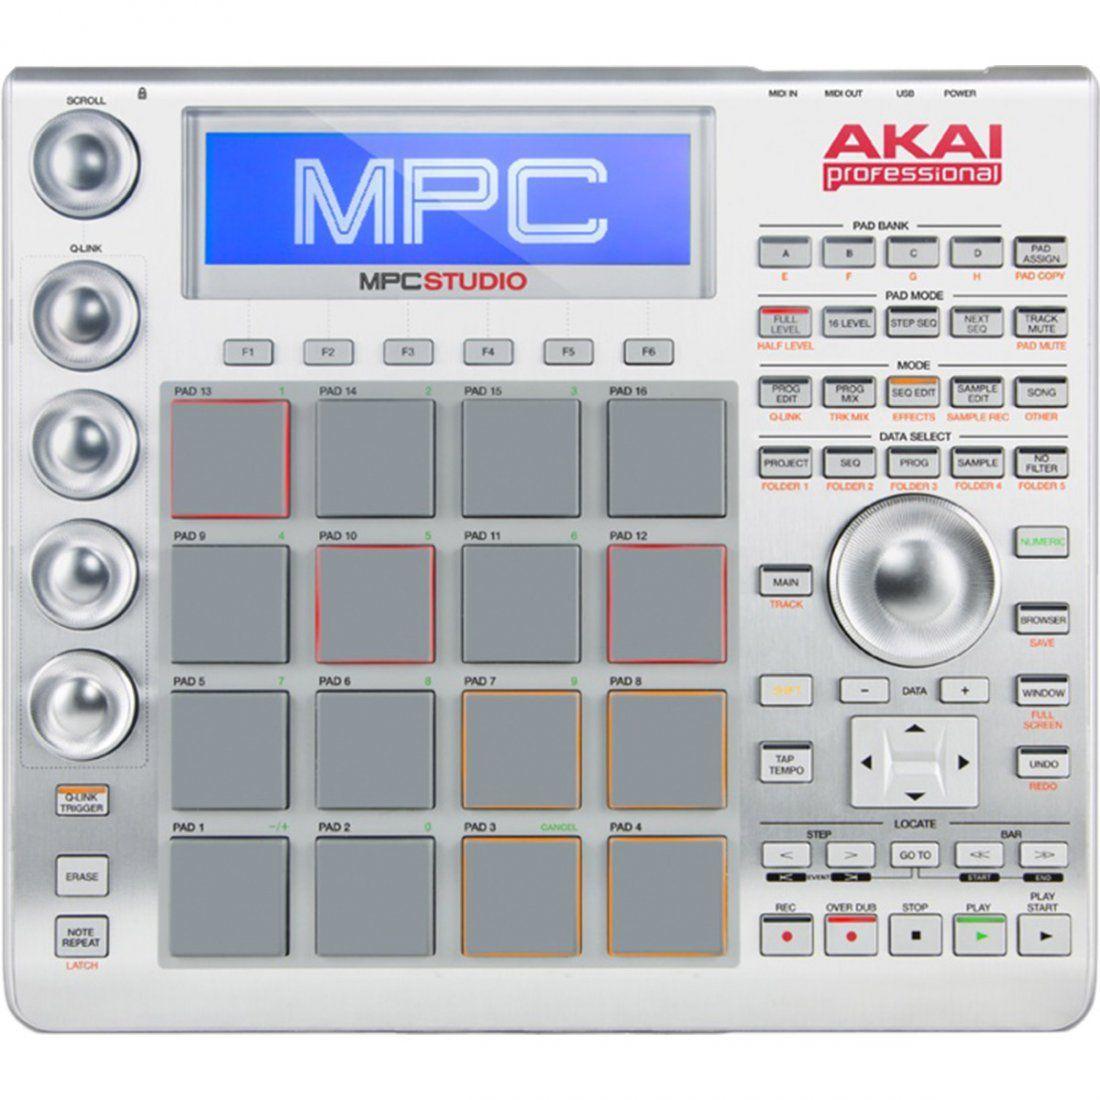 Akai MPC Studio Sampler MPC Studio Drum Machine 16 Pads